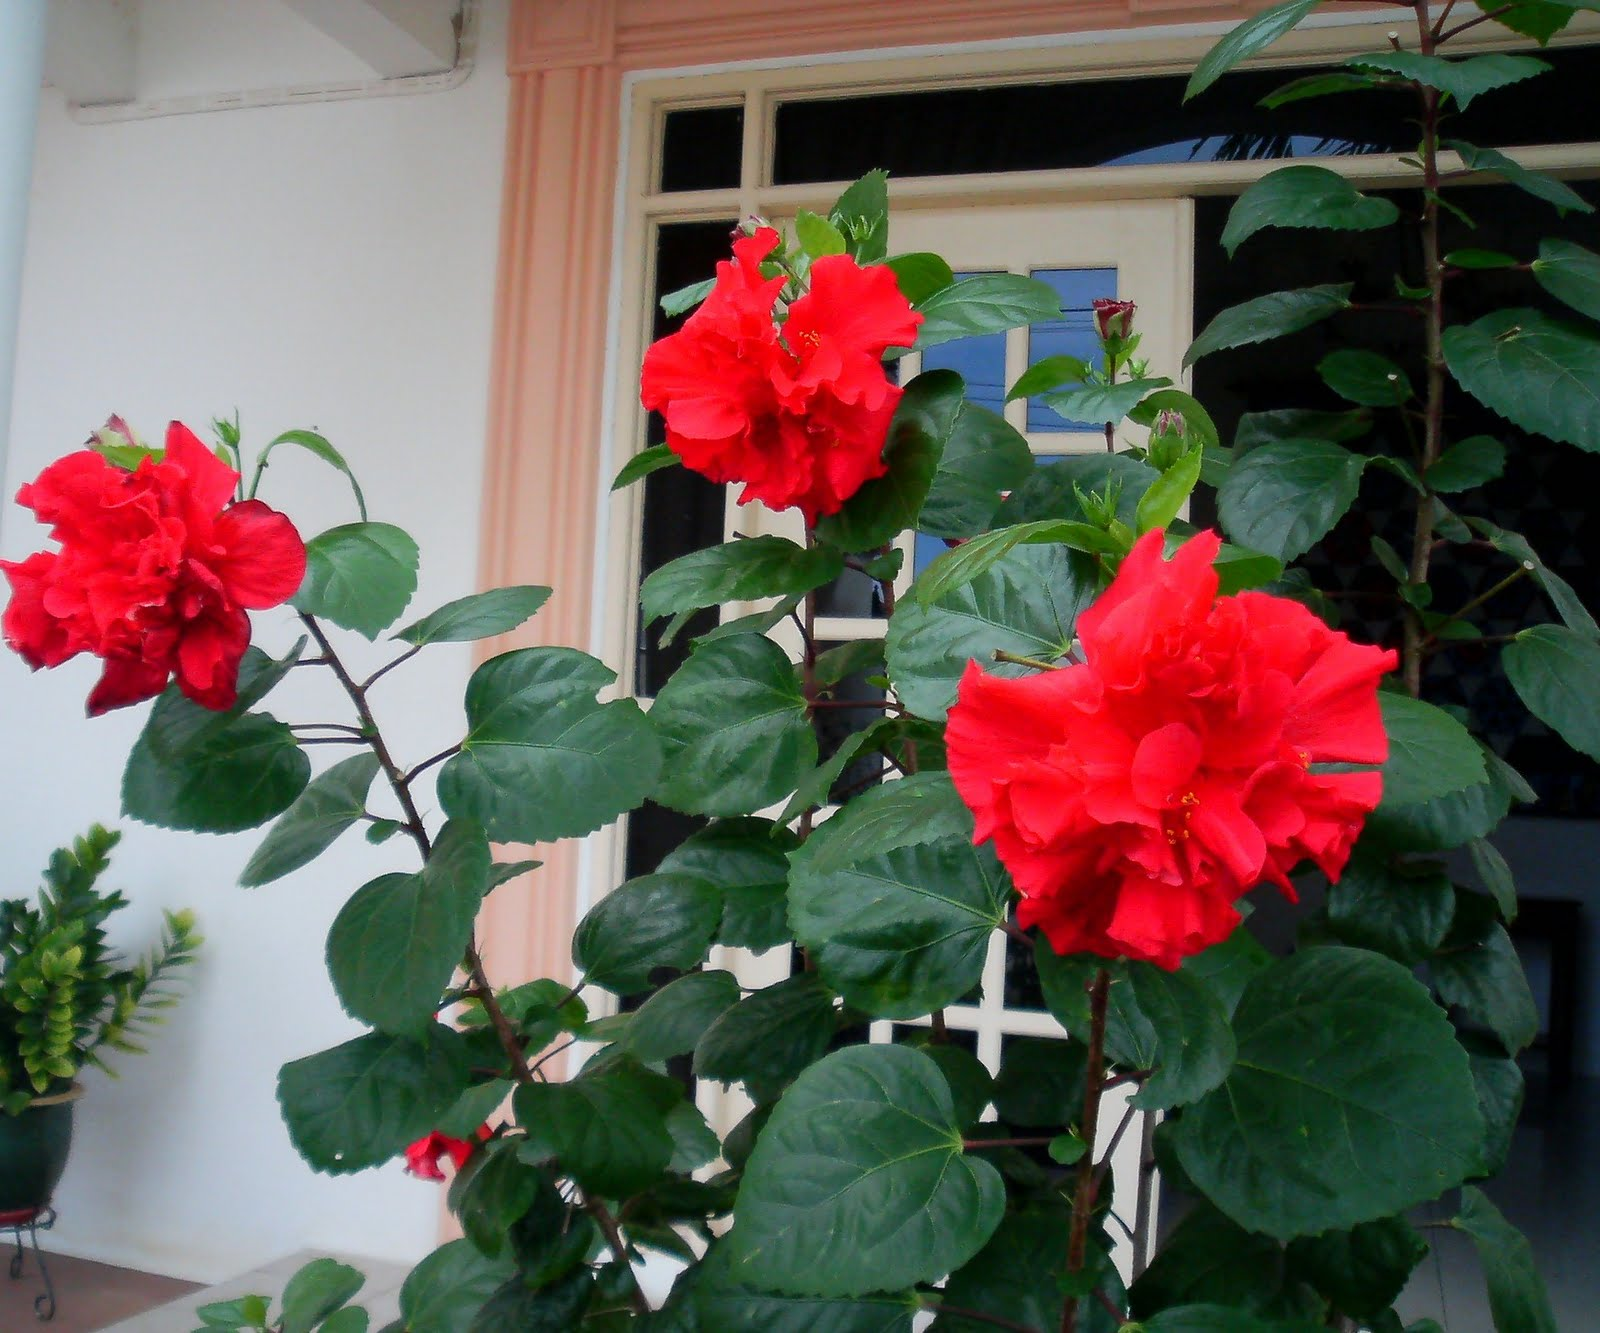 Laman kambatik plants list 3rd ed hibiscus hybrid double red hibiscus hybrid double red izmirmasajfo Image collections